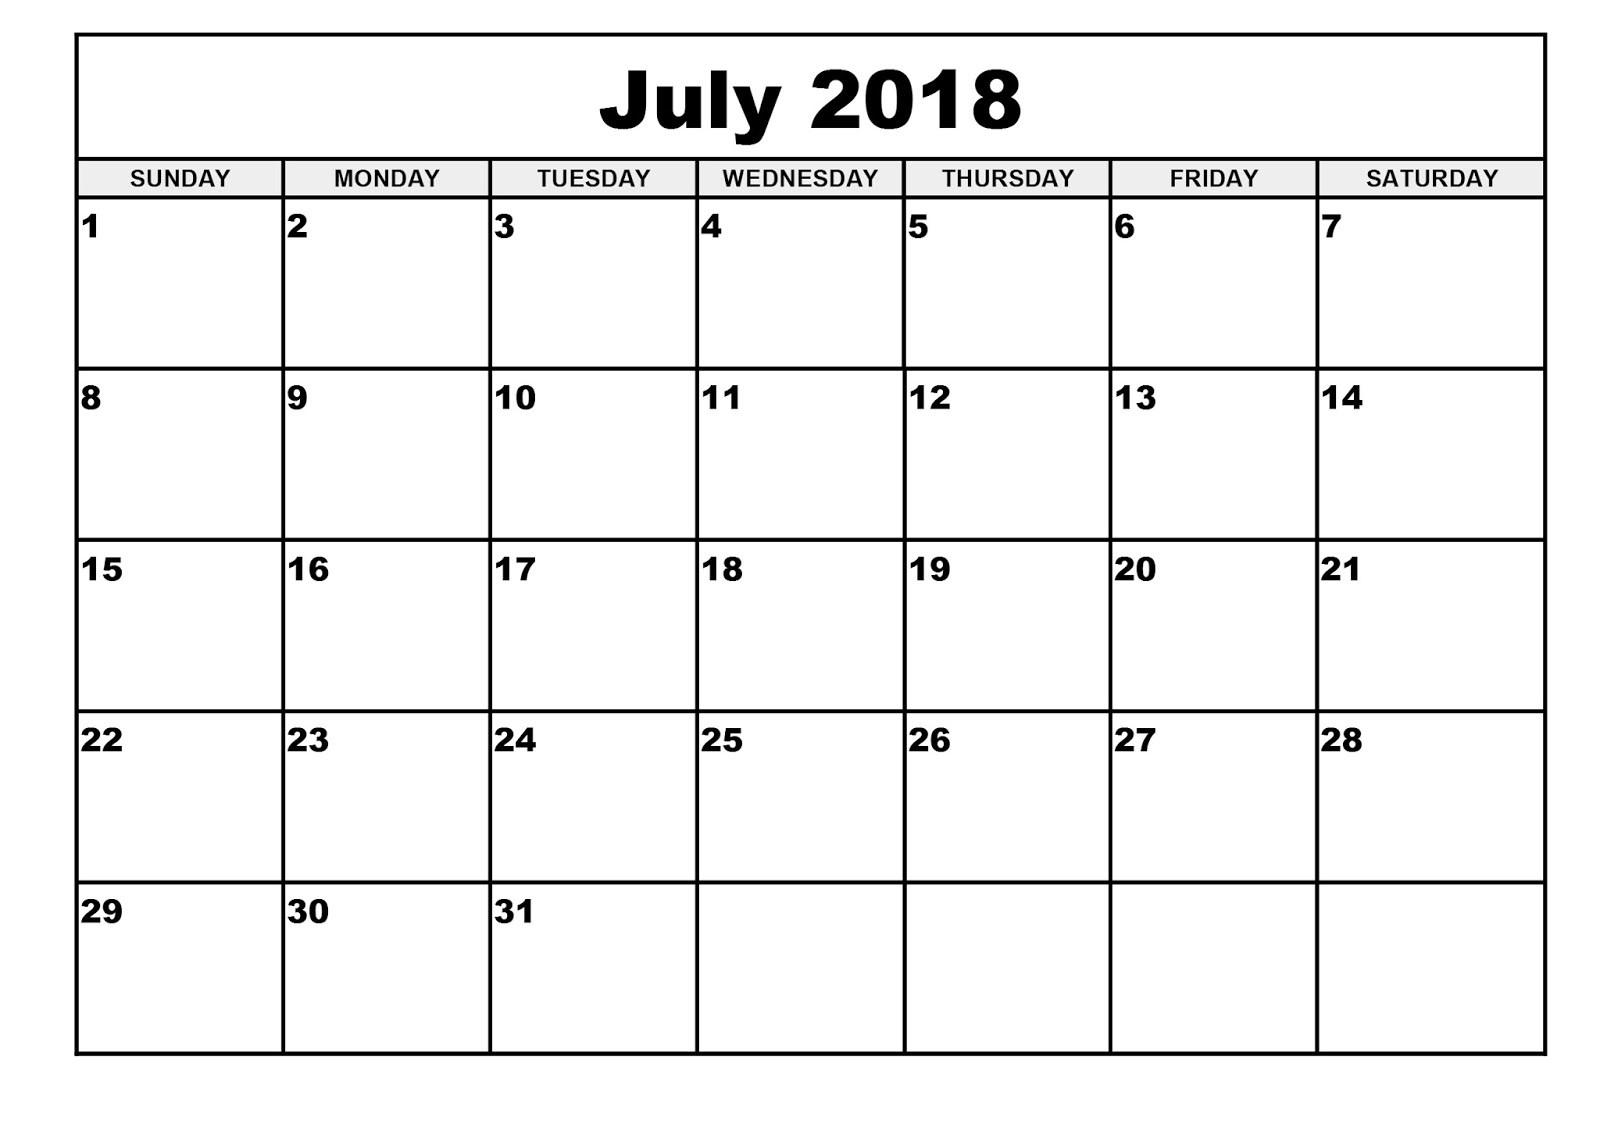 Free July 2018 Calendar Printable Blank Templates - Word Pdf with regard to Blank July Calendar Printable